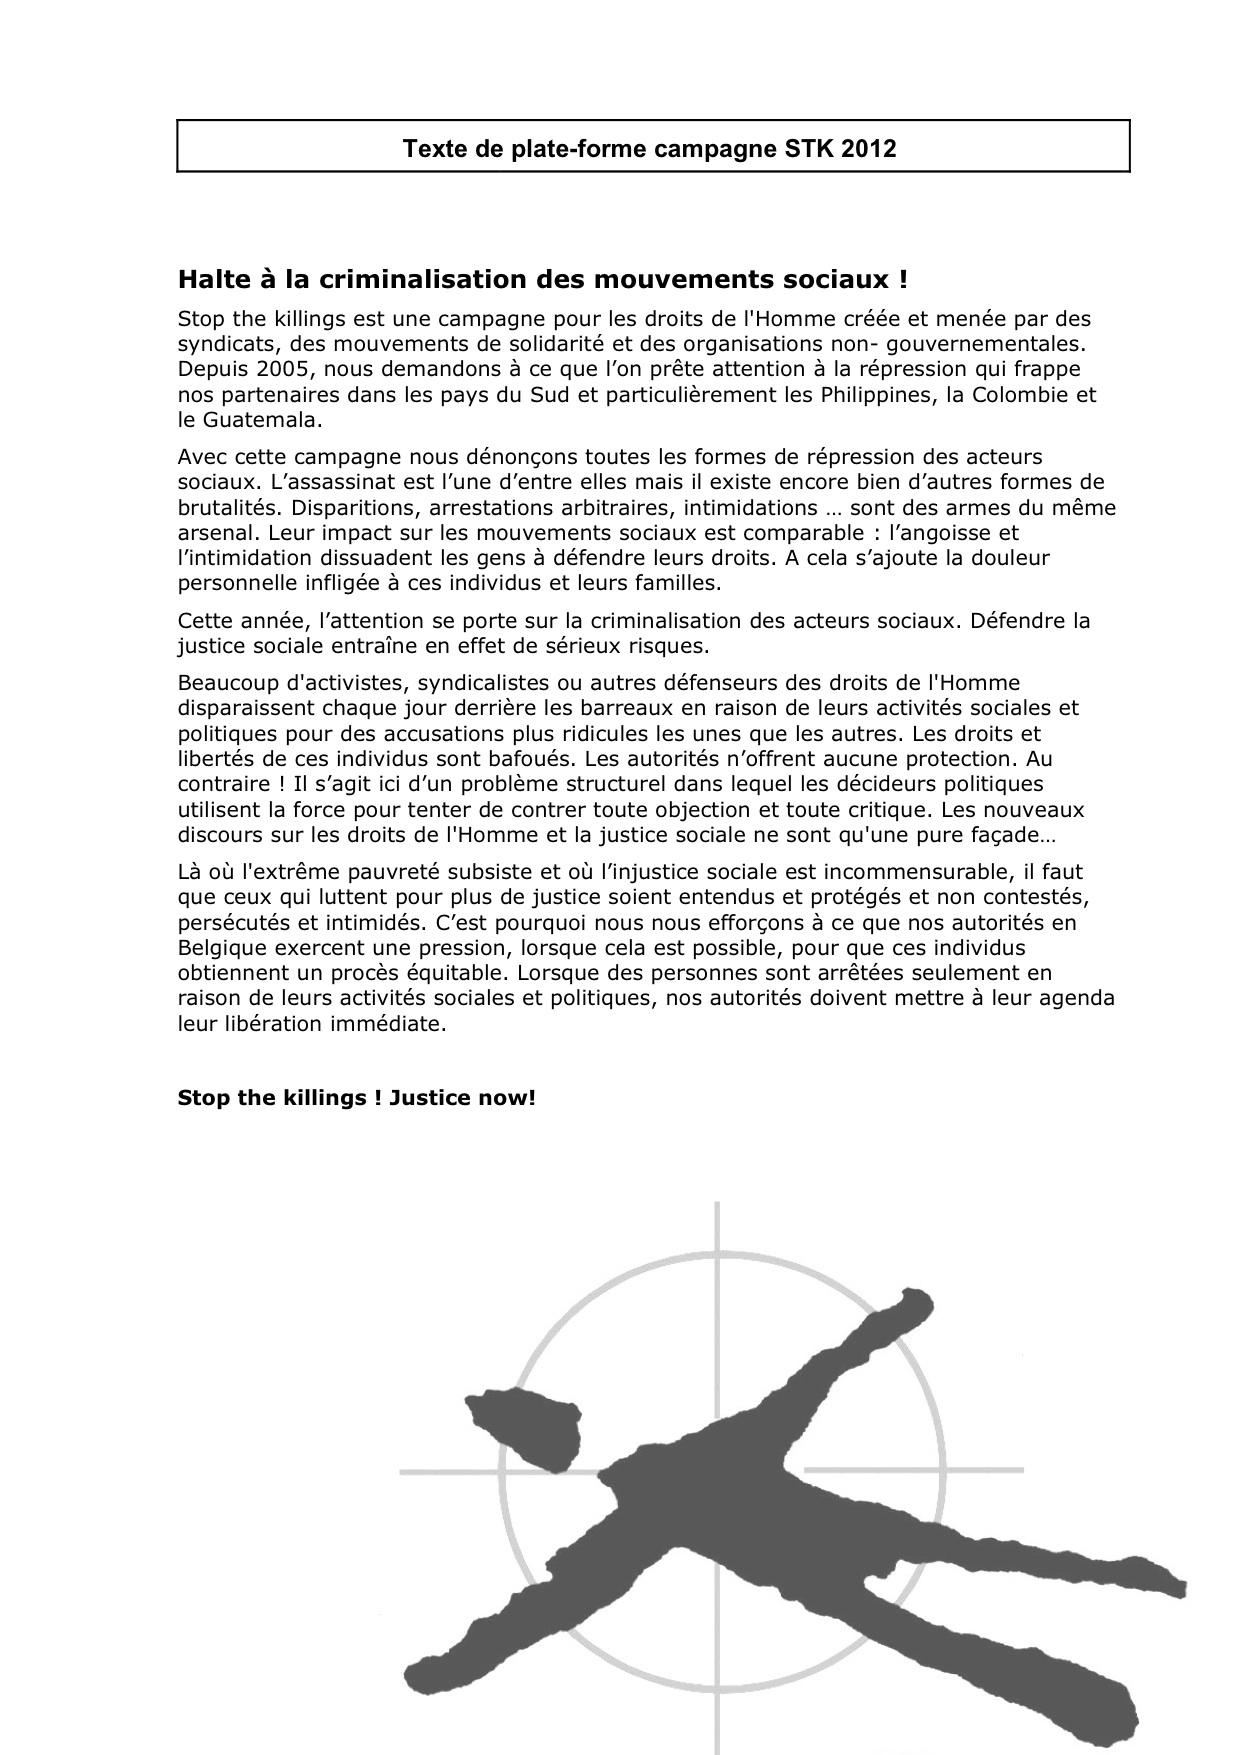 Texte_de_plate_forme_action_STK_2012.jpg